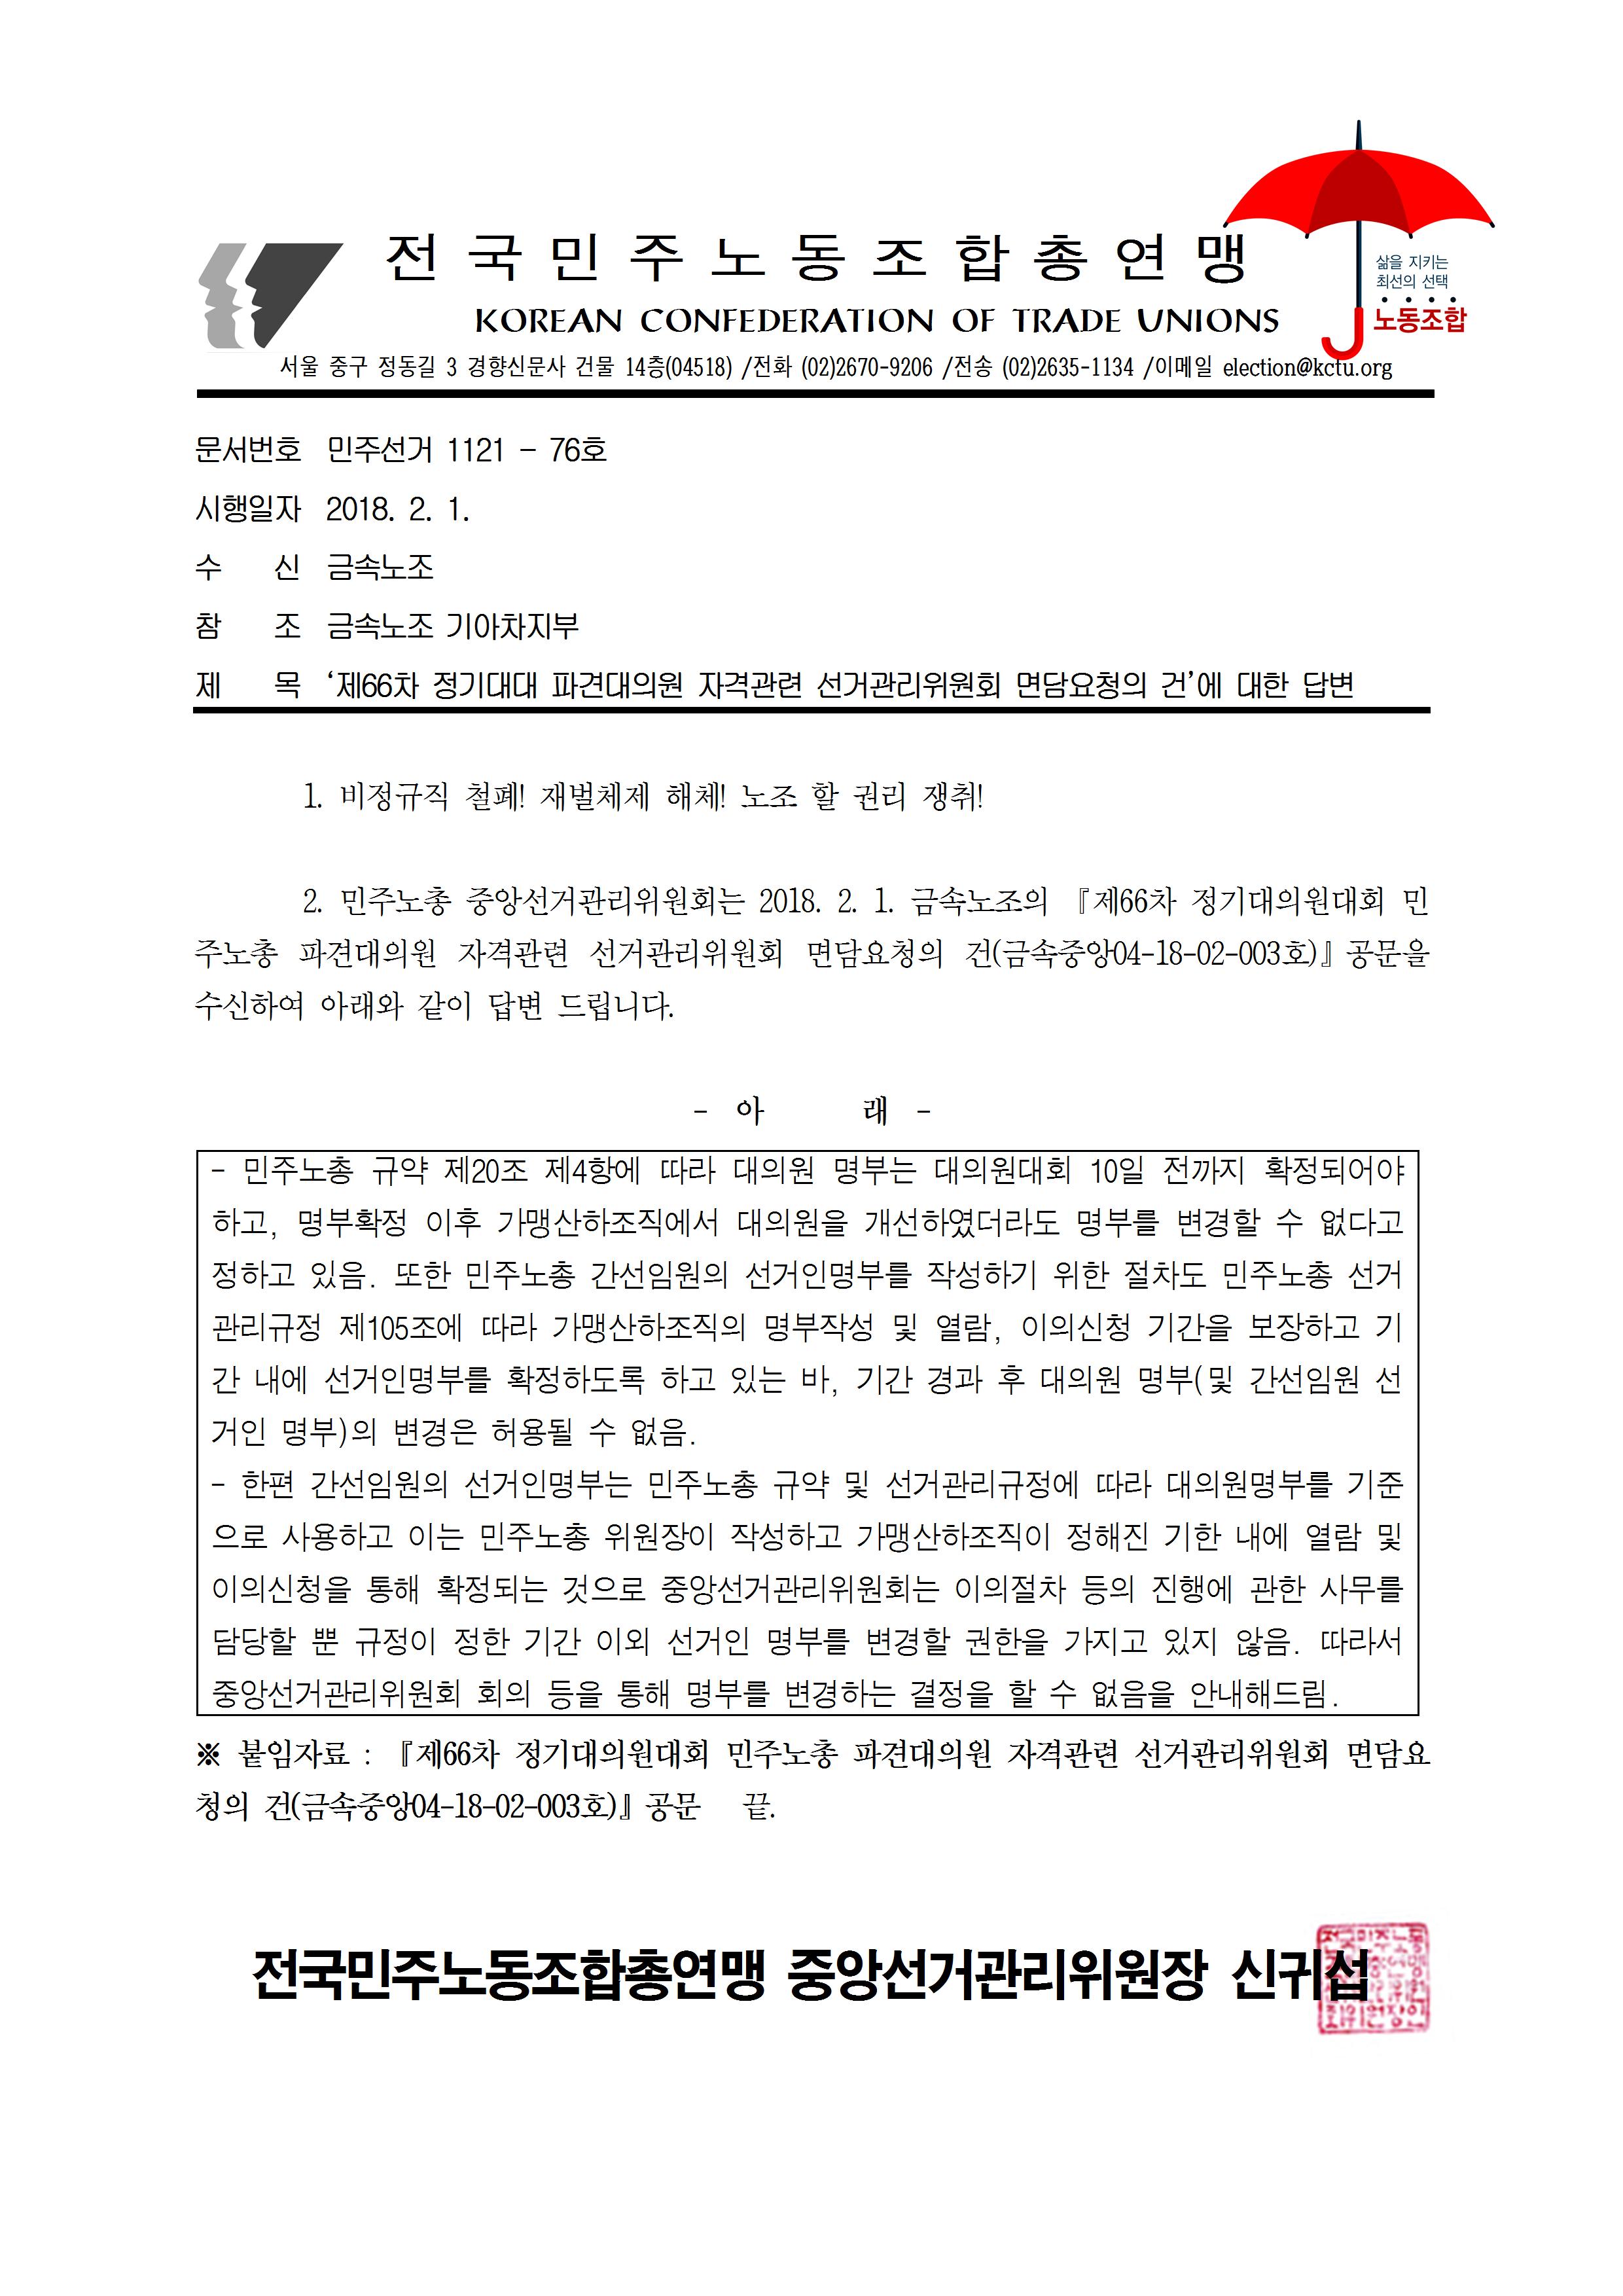 18kctu76_'제66차 정기대대 파견대의원 자격관련 선거관리위원회 면담요청의 건'에 대한 답변001.png